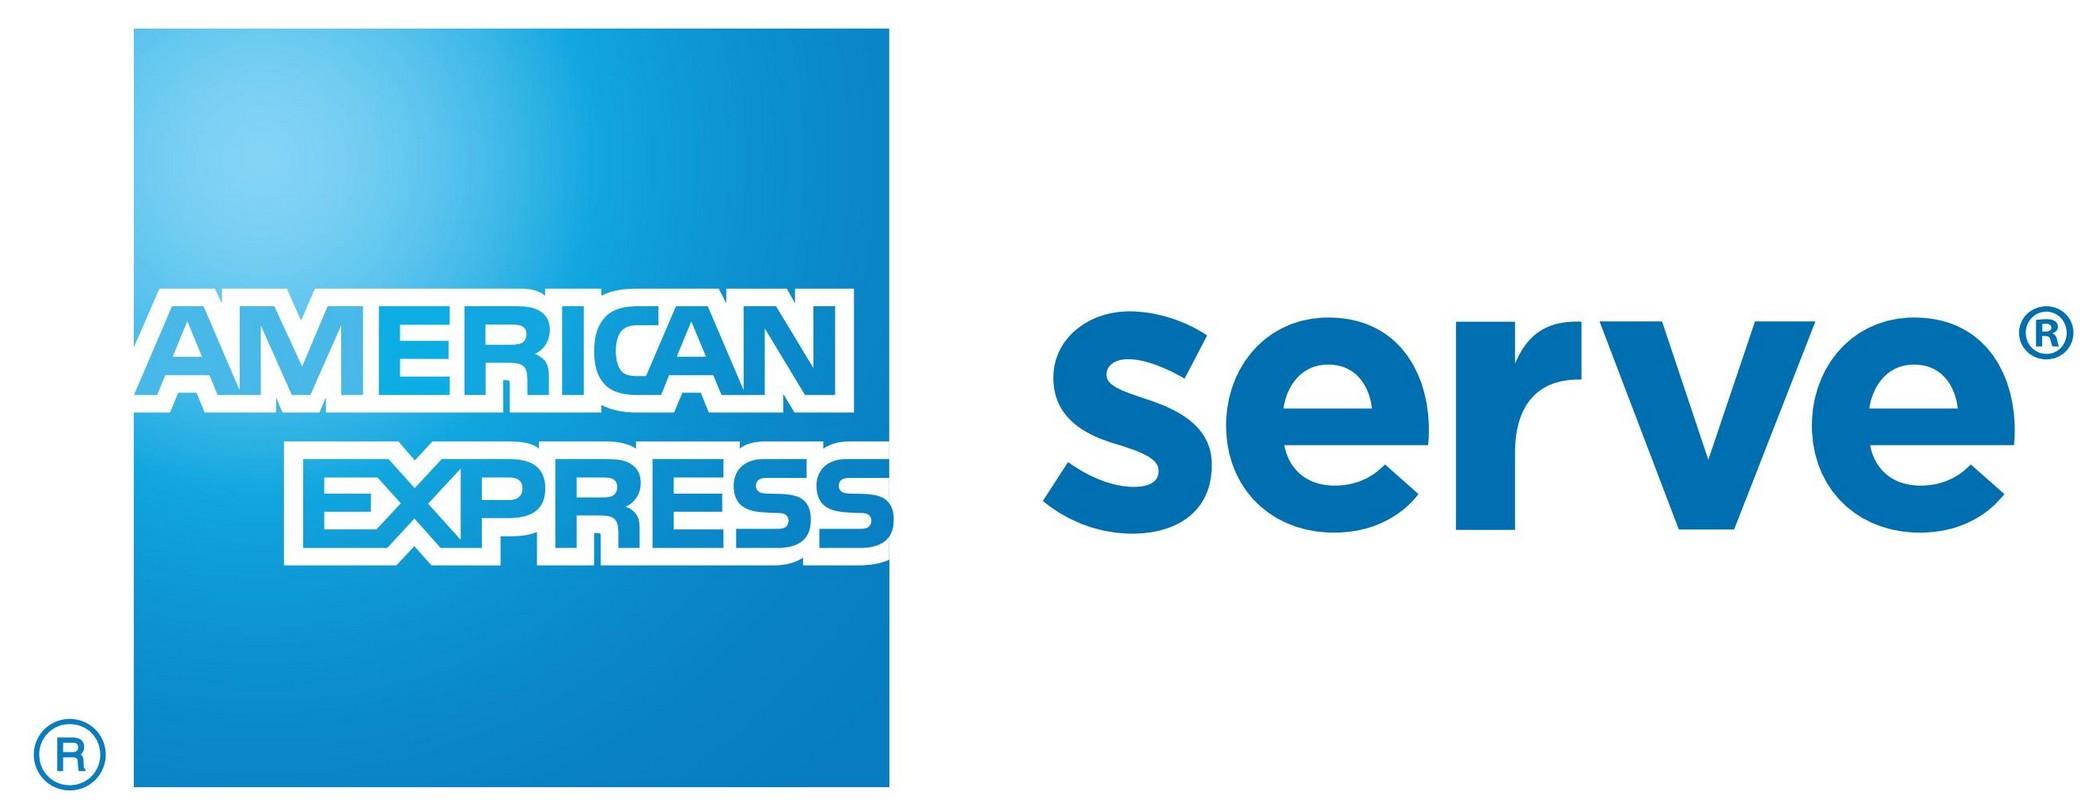 2100x811 Serve Logo [American Express] Png Free Downloads, Logo Brand Emblems